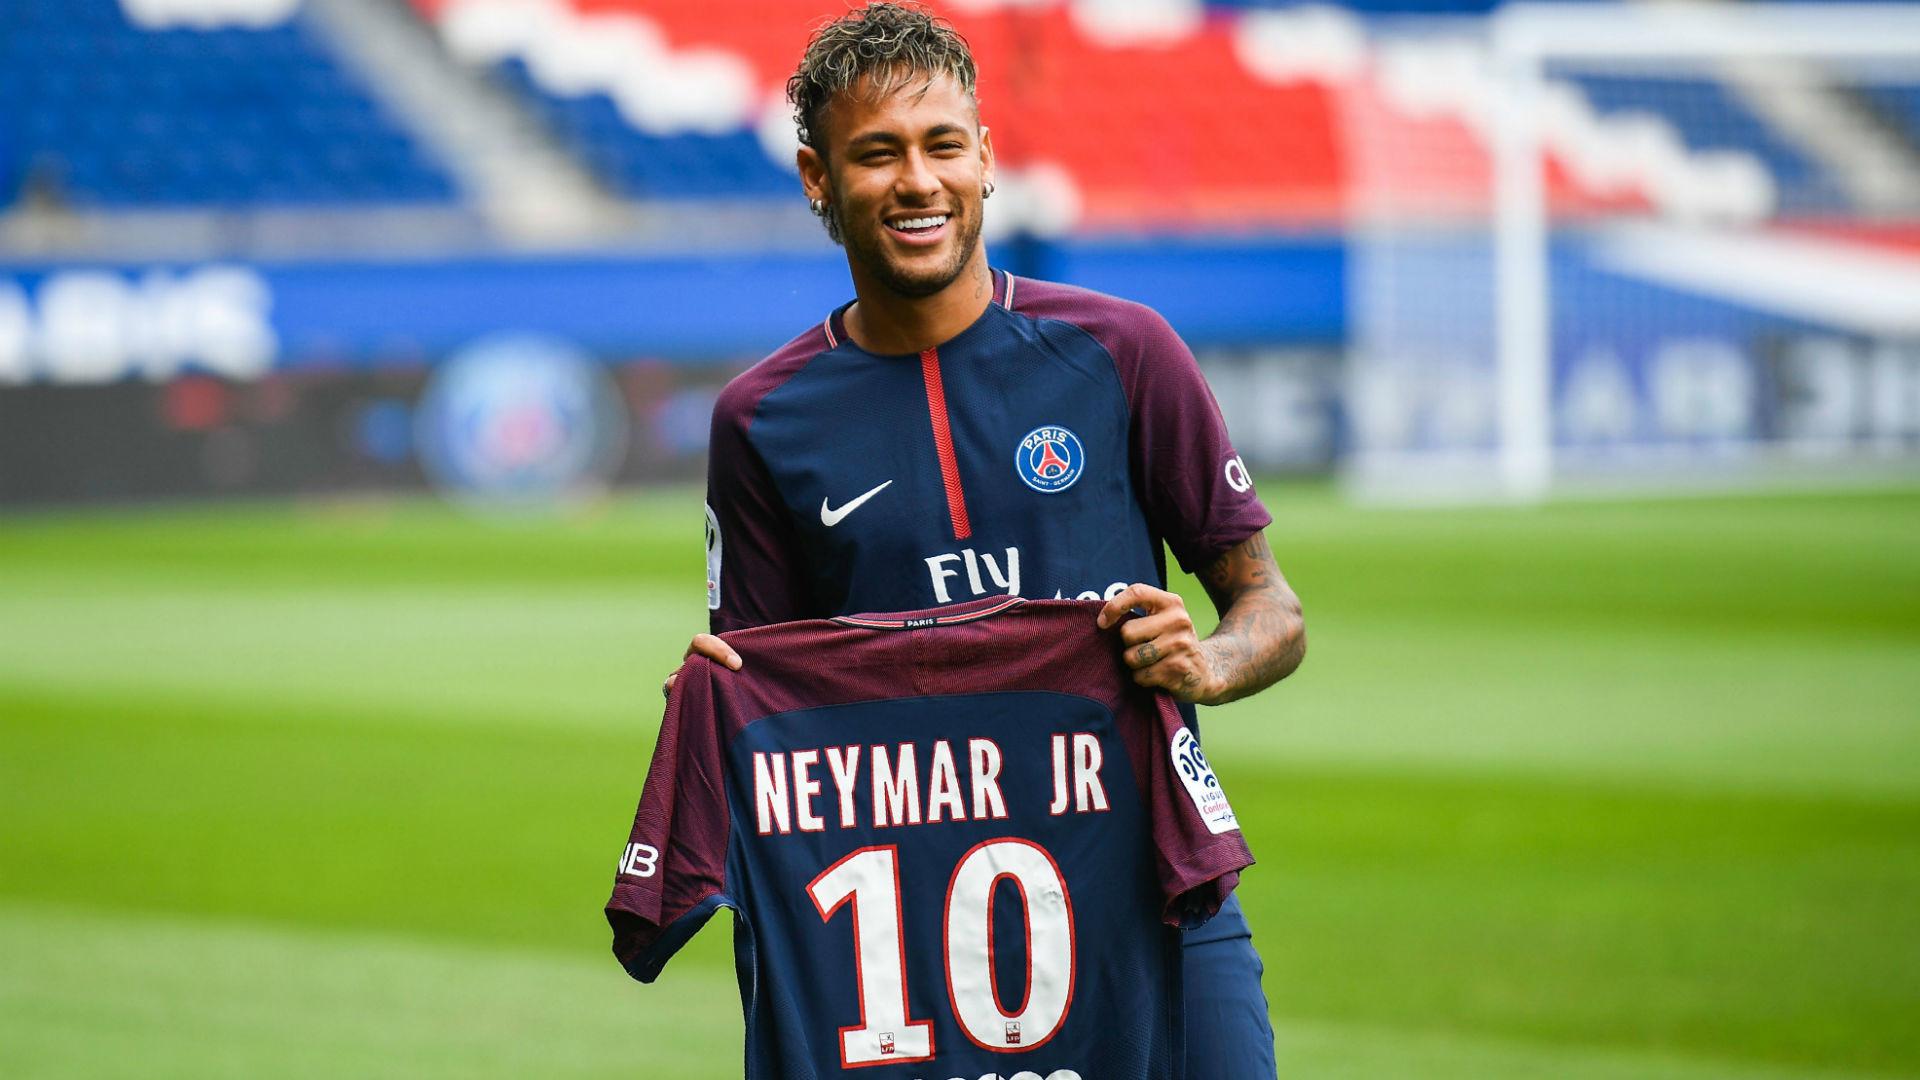 Neymar holding his PSG number 10 shirt